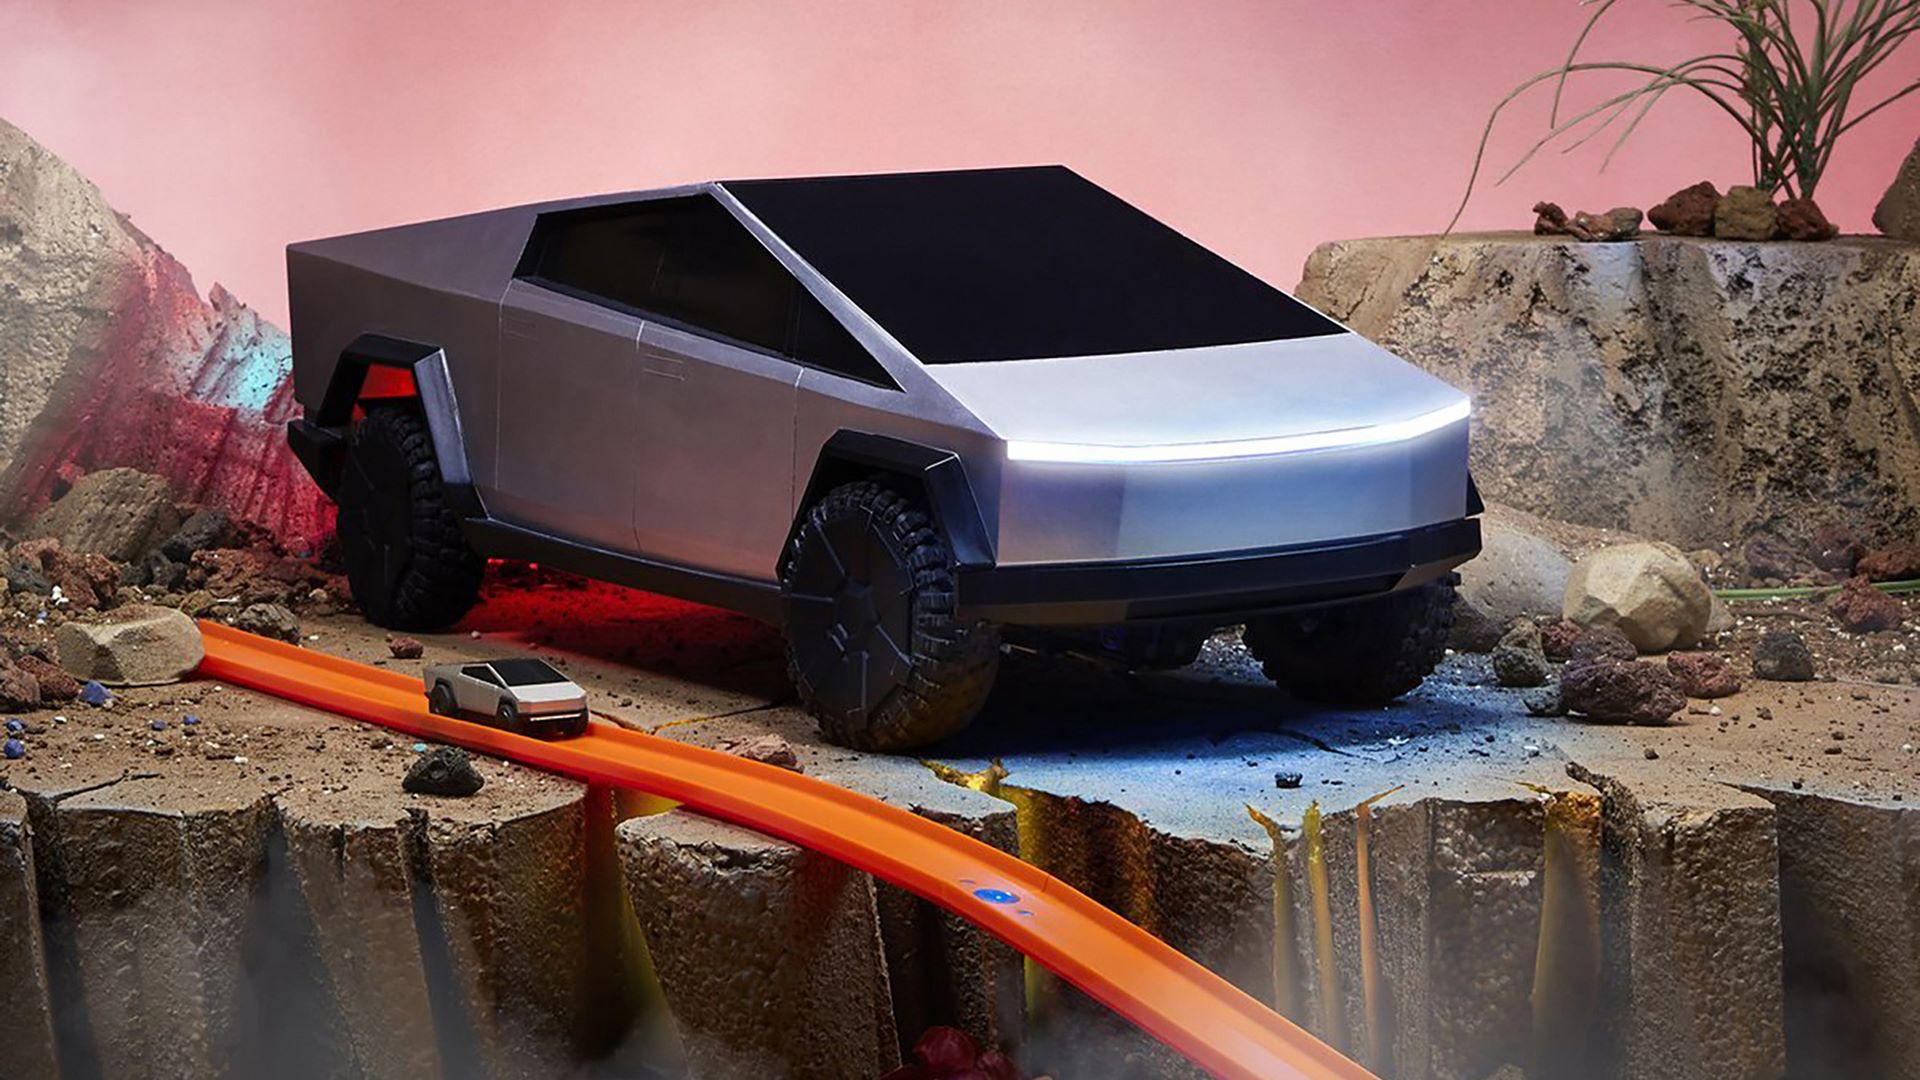 Hot-Wheels-RC-Tesla-Cybertruck-1